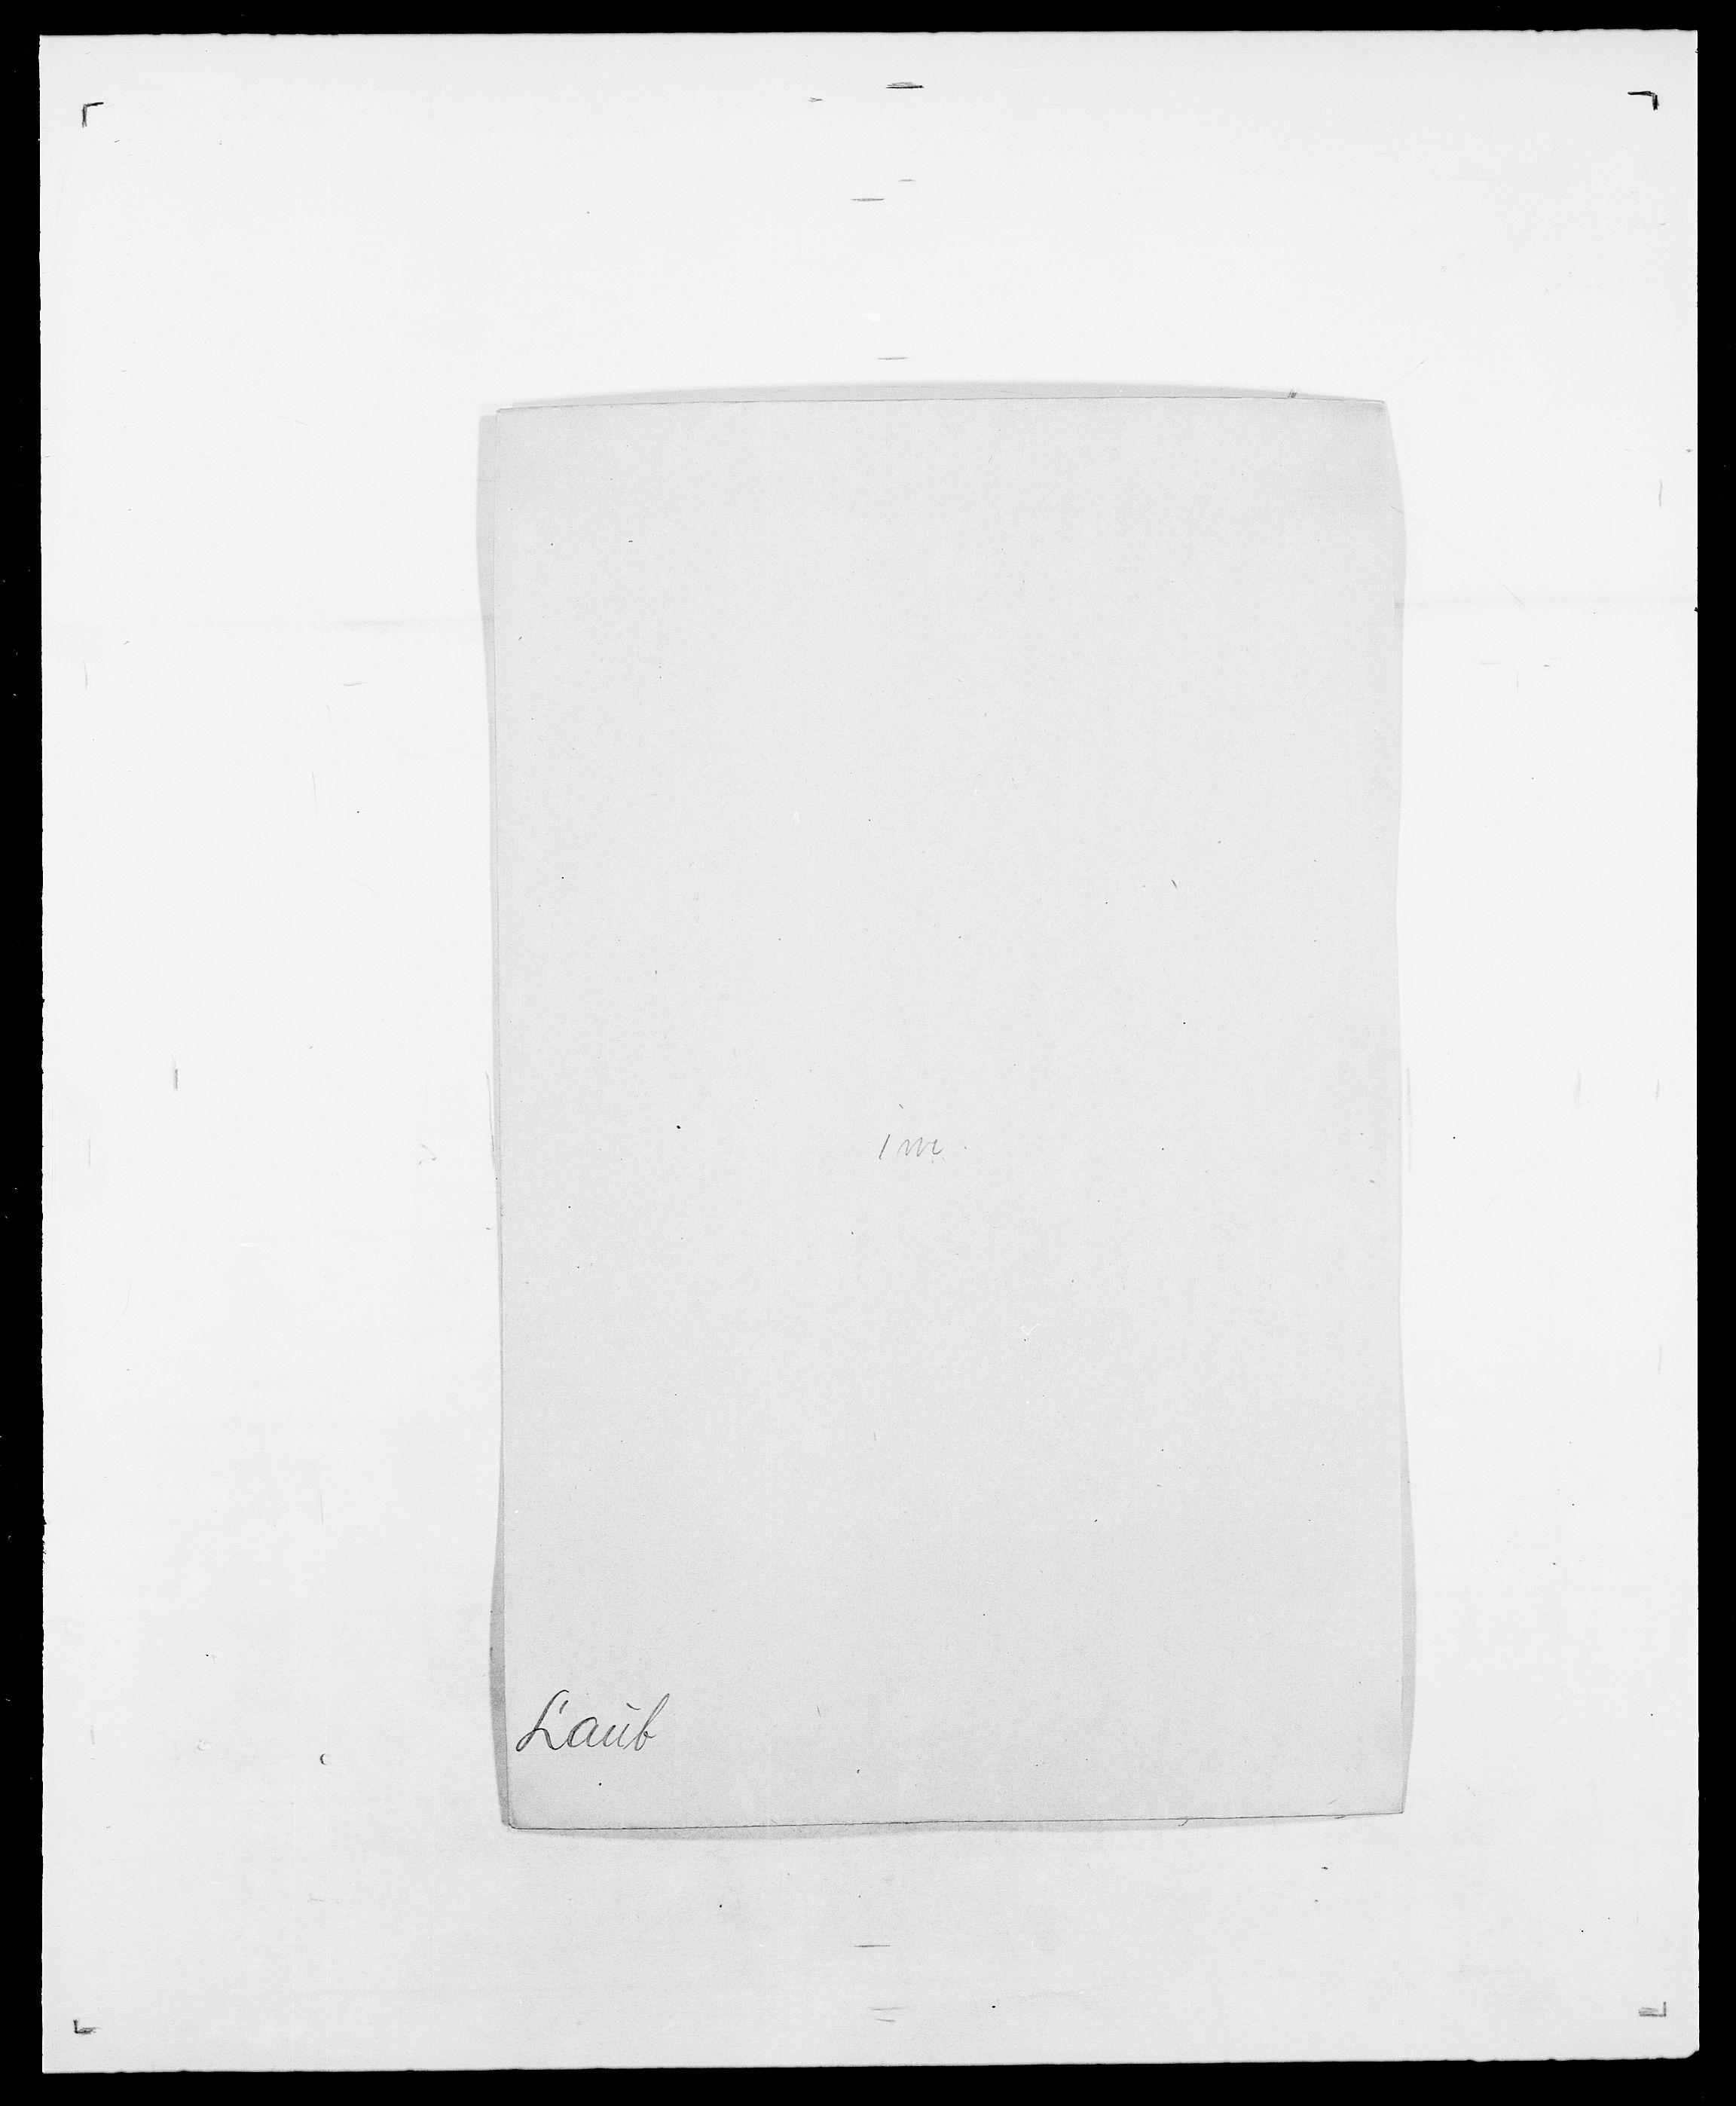 SAO, Delgobe, Charles Antoine - samling, D/Da/L0023: Lau - Lirvyn, s. 4